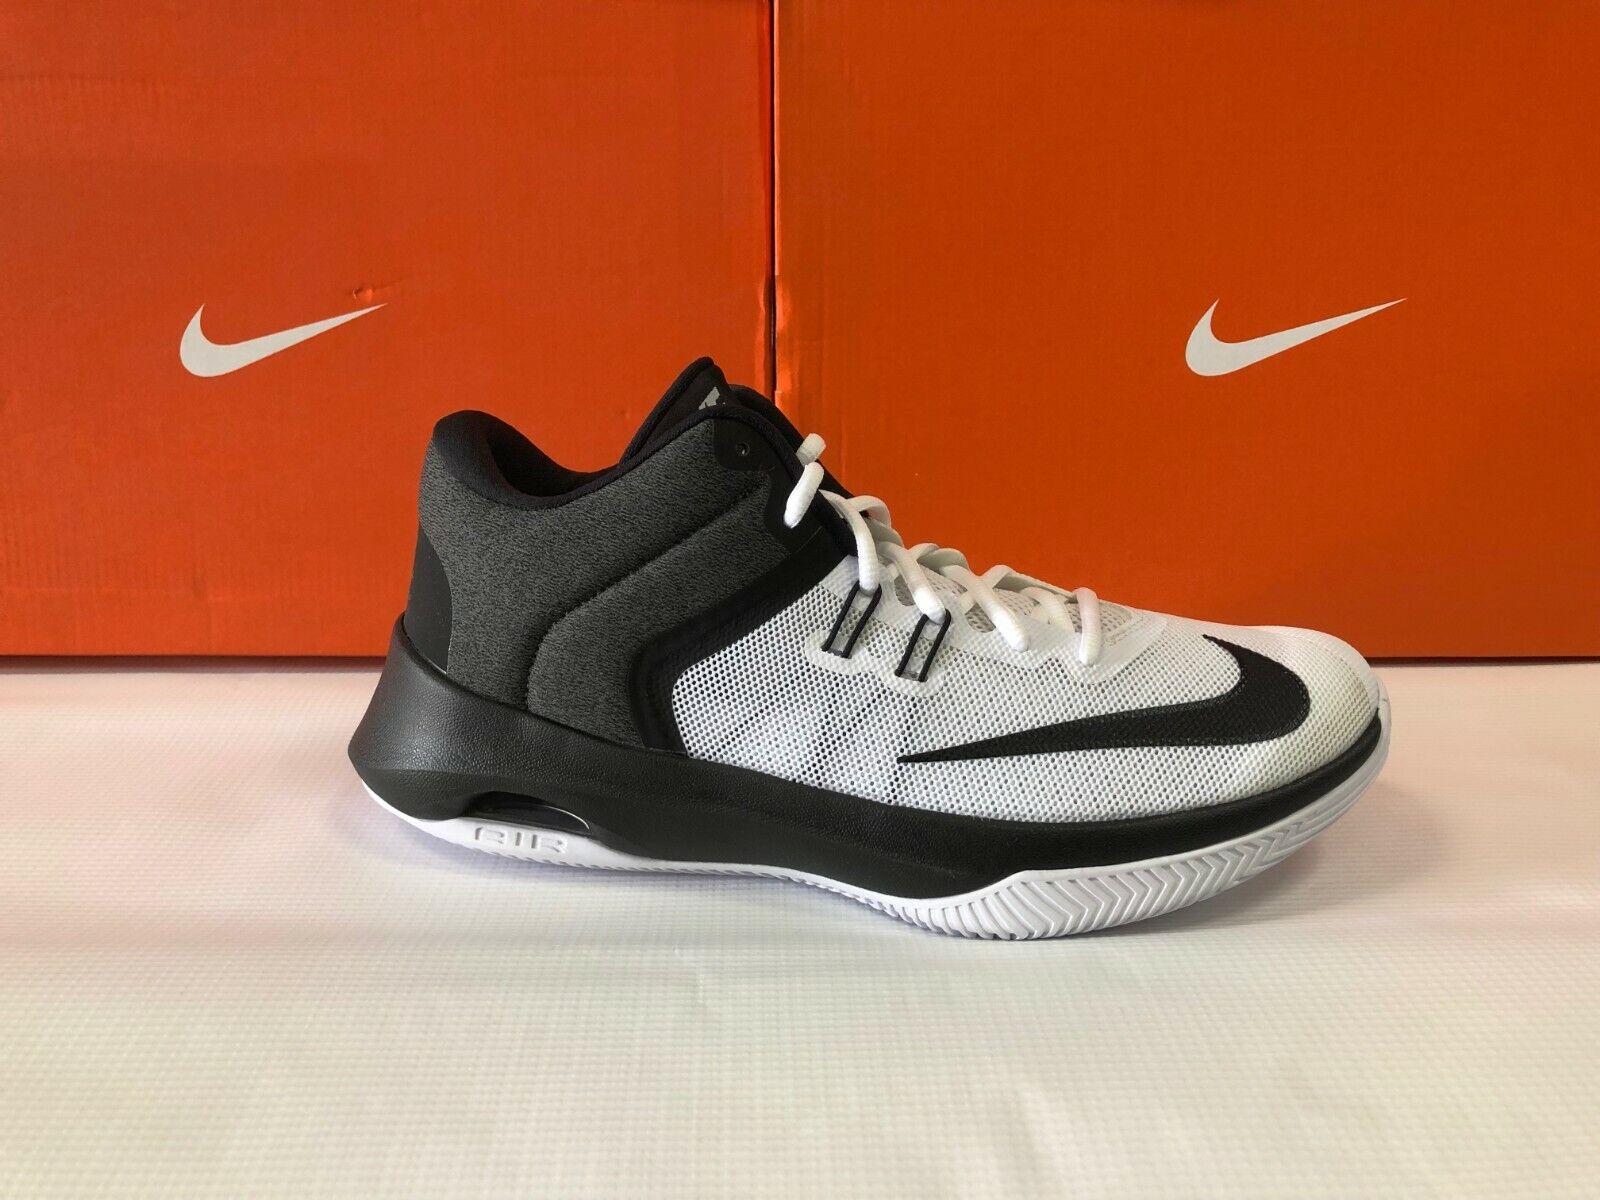 2c52e91d3827f2 Men Nike Air Versitile II Basketball shoes 921692100 921692100 921692100  f9d6f2 ...